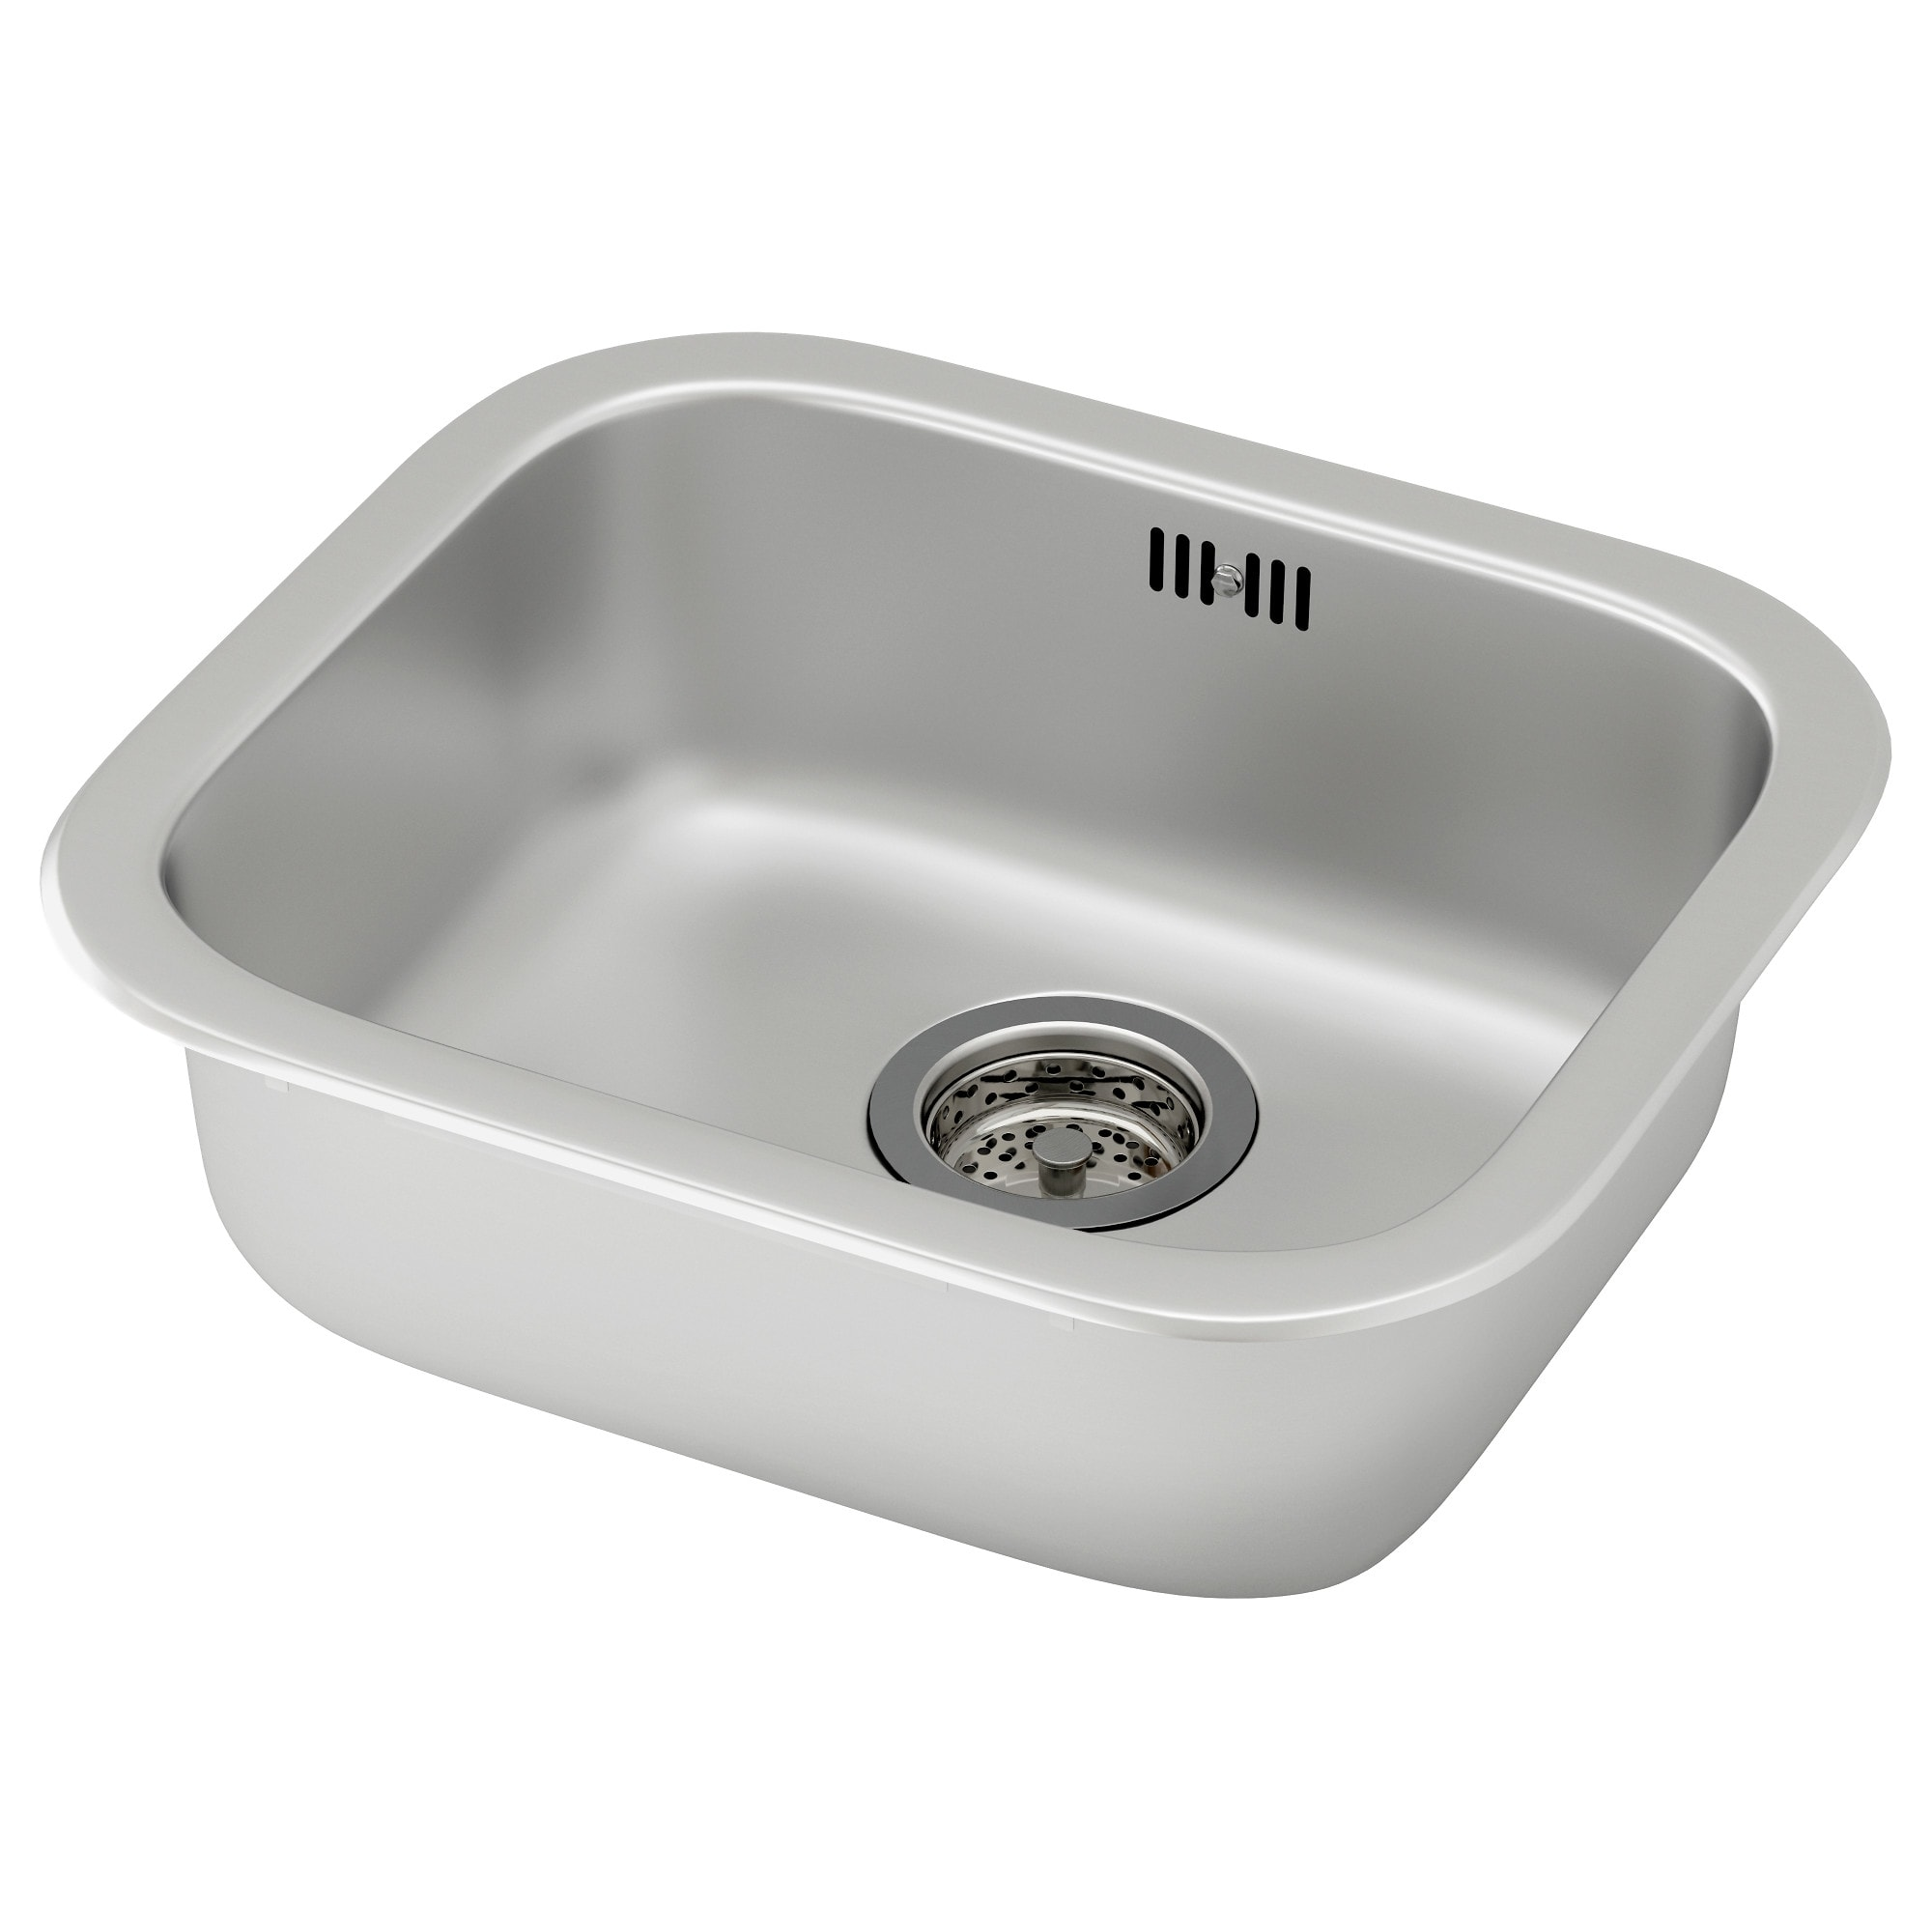 Fyndig Einbauspule 1 Becken Edelstahl In 2019 Inset Sink Sink